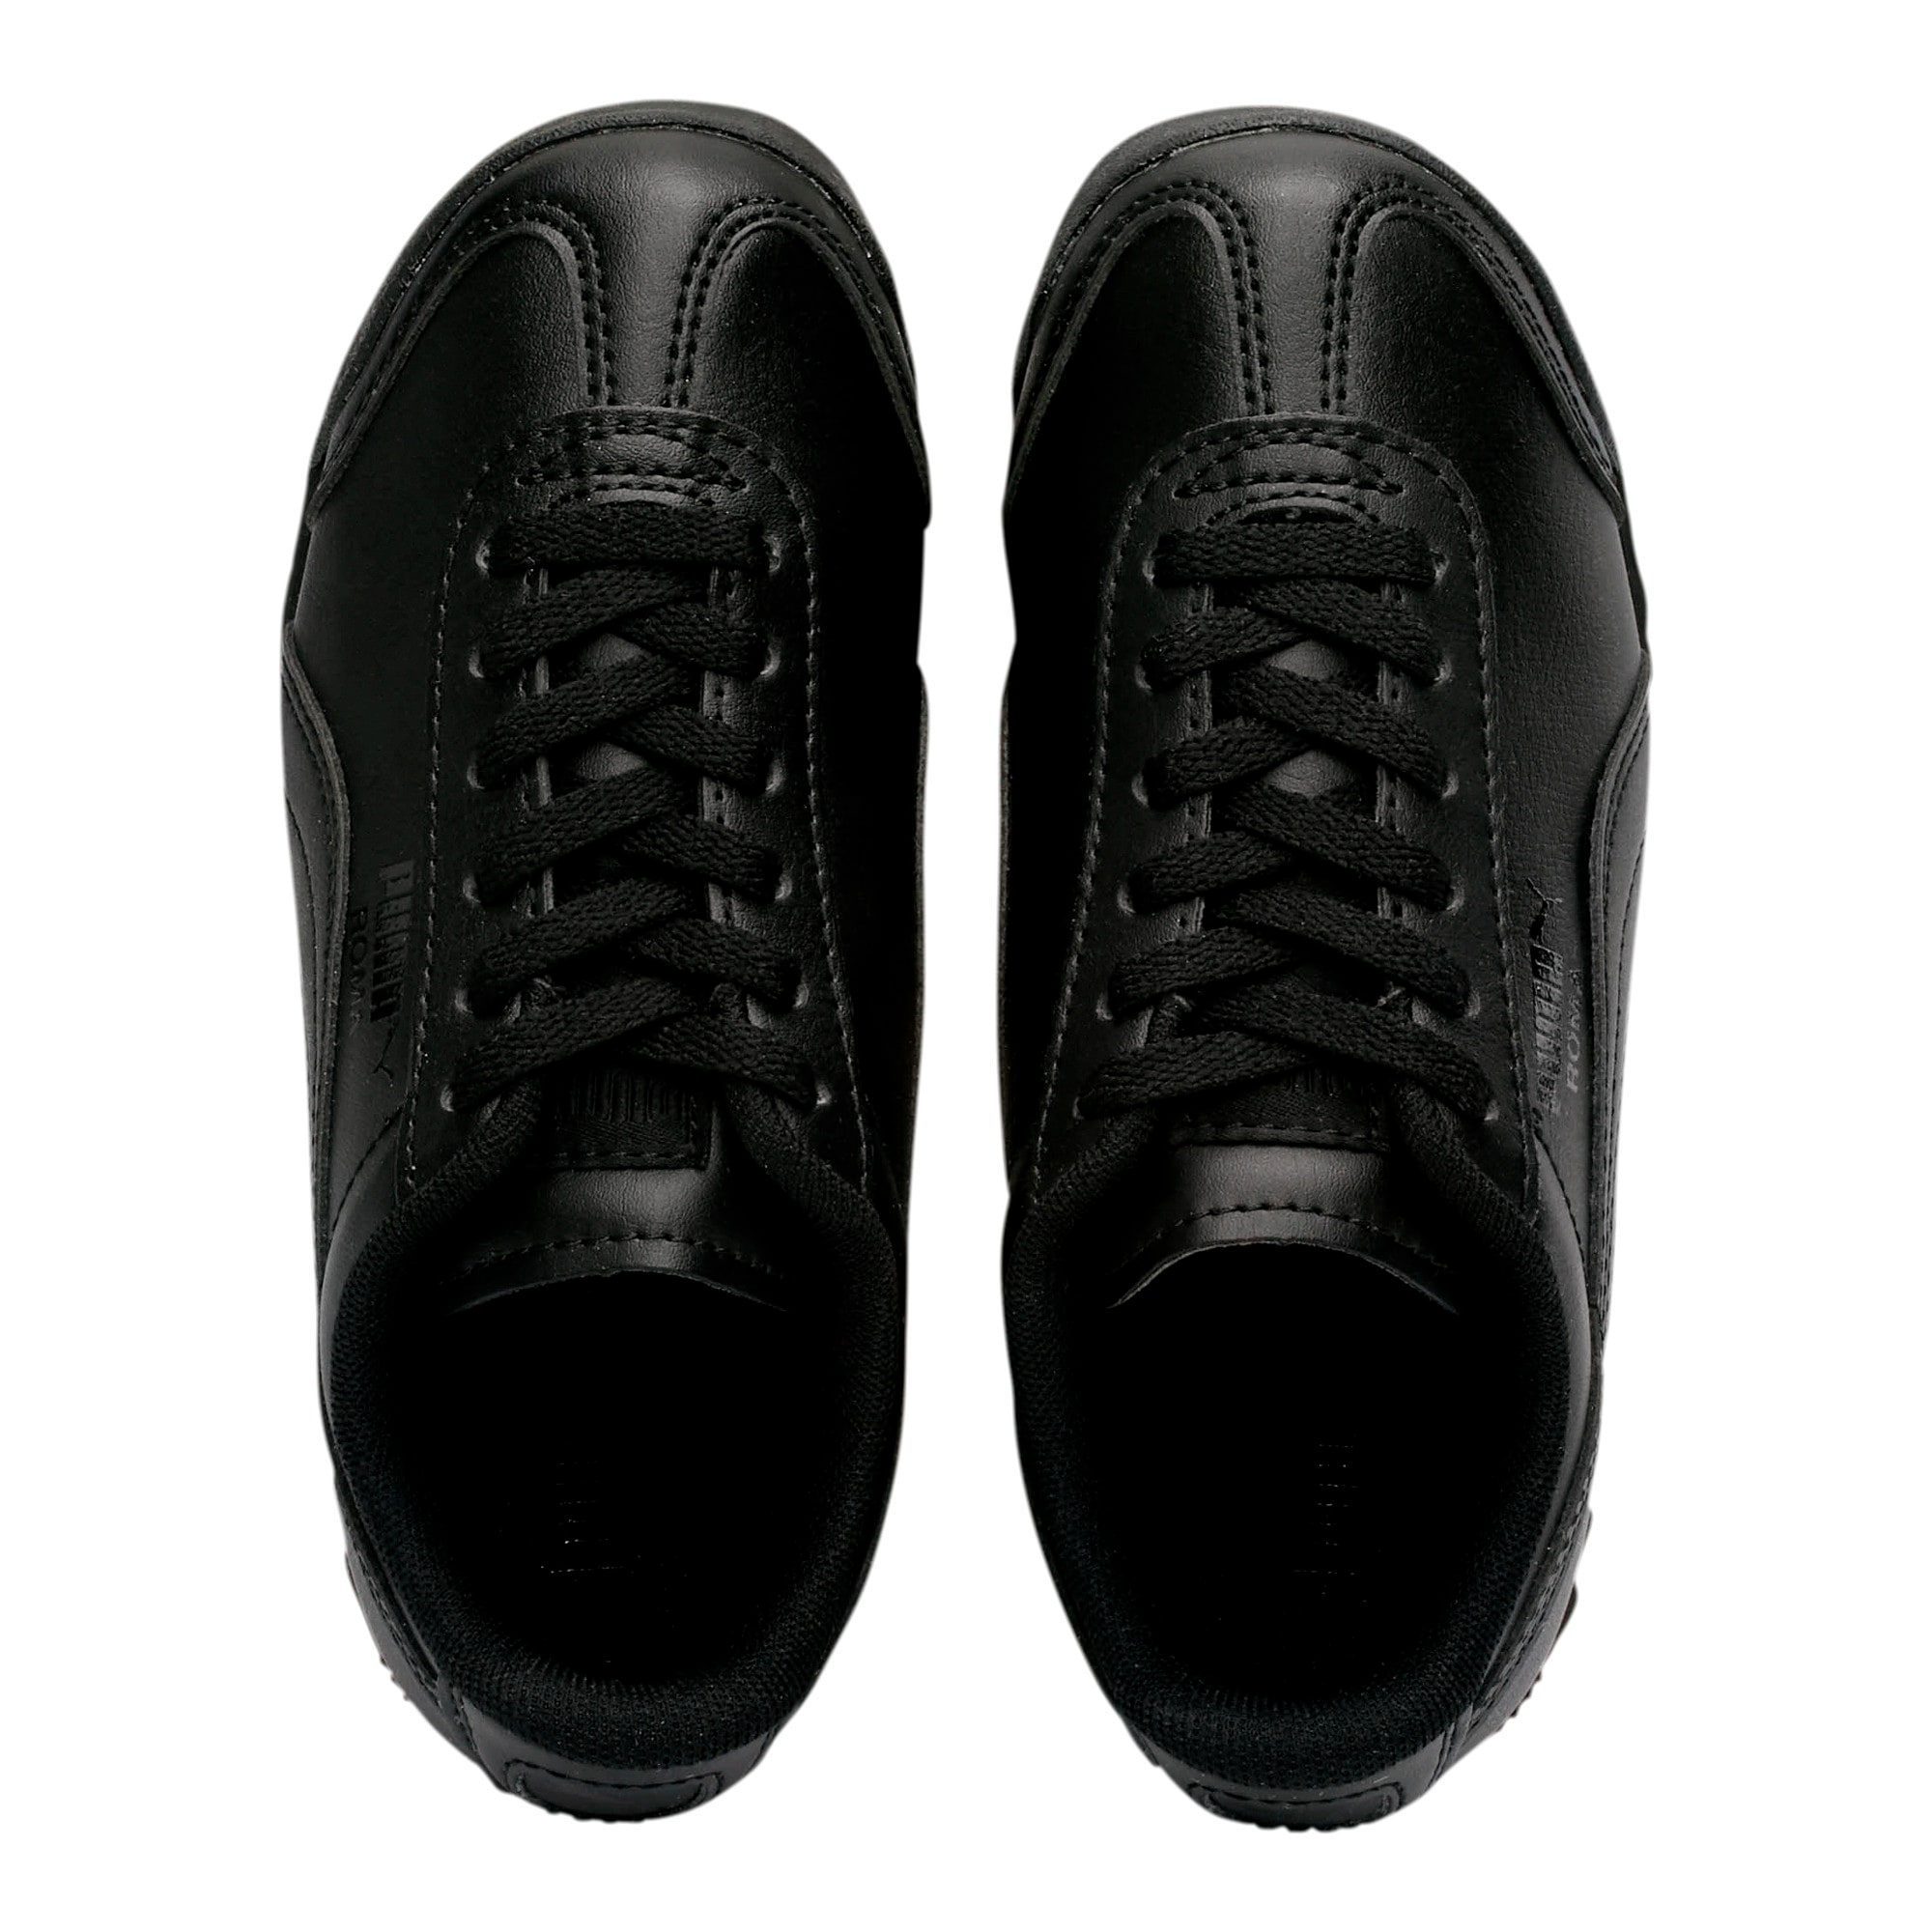 Thumbnail 6 of Roma Basic Little Kids' Shoes, Puma Black-Puma Black, medium